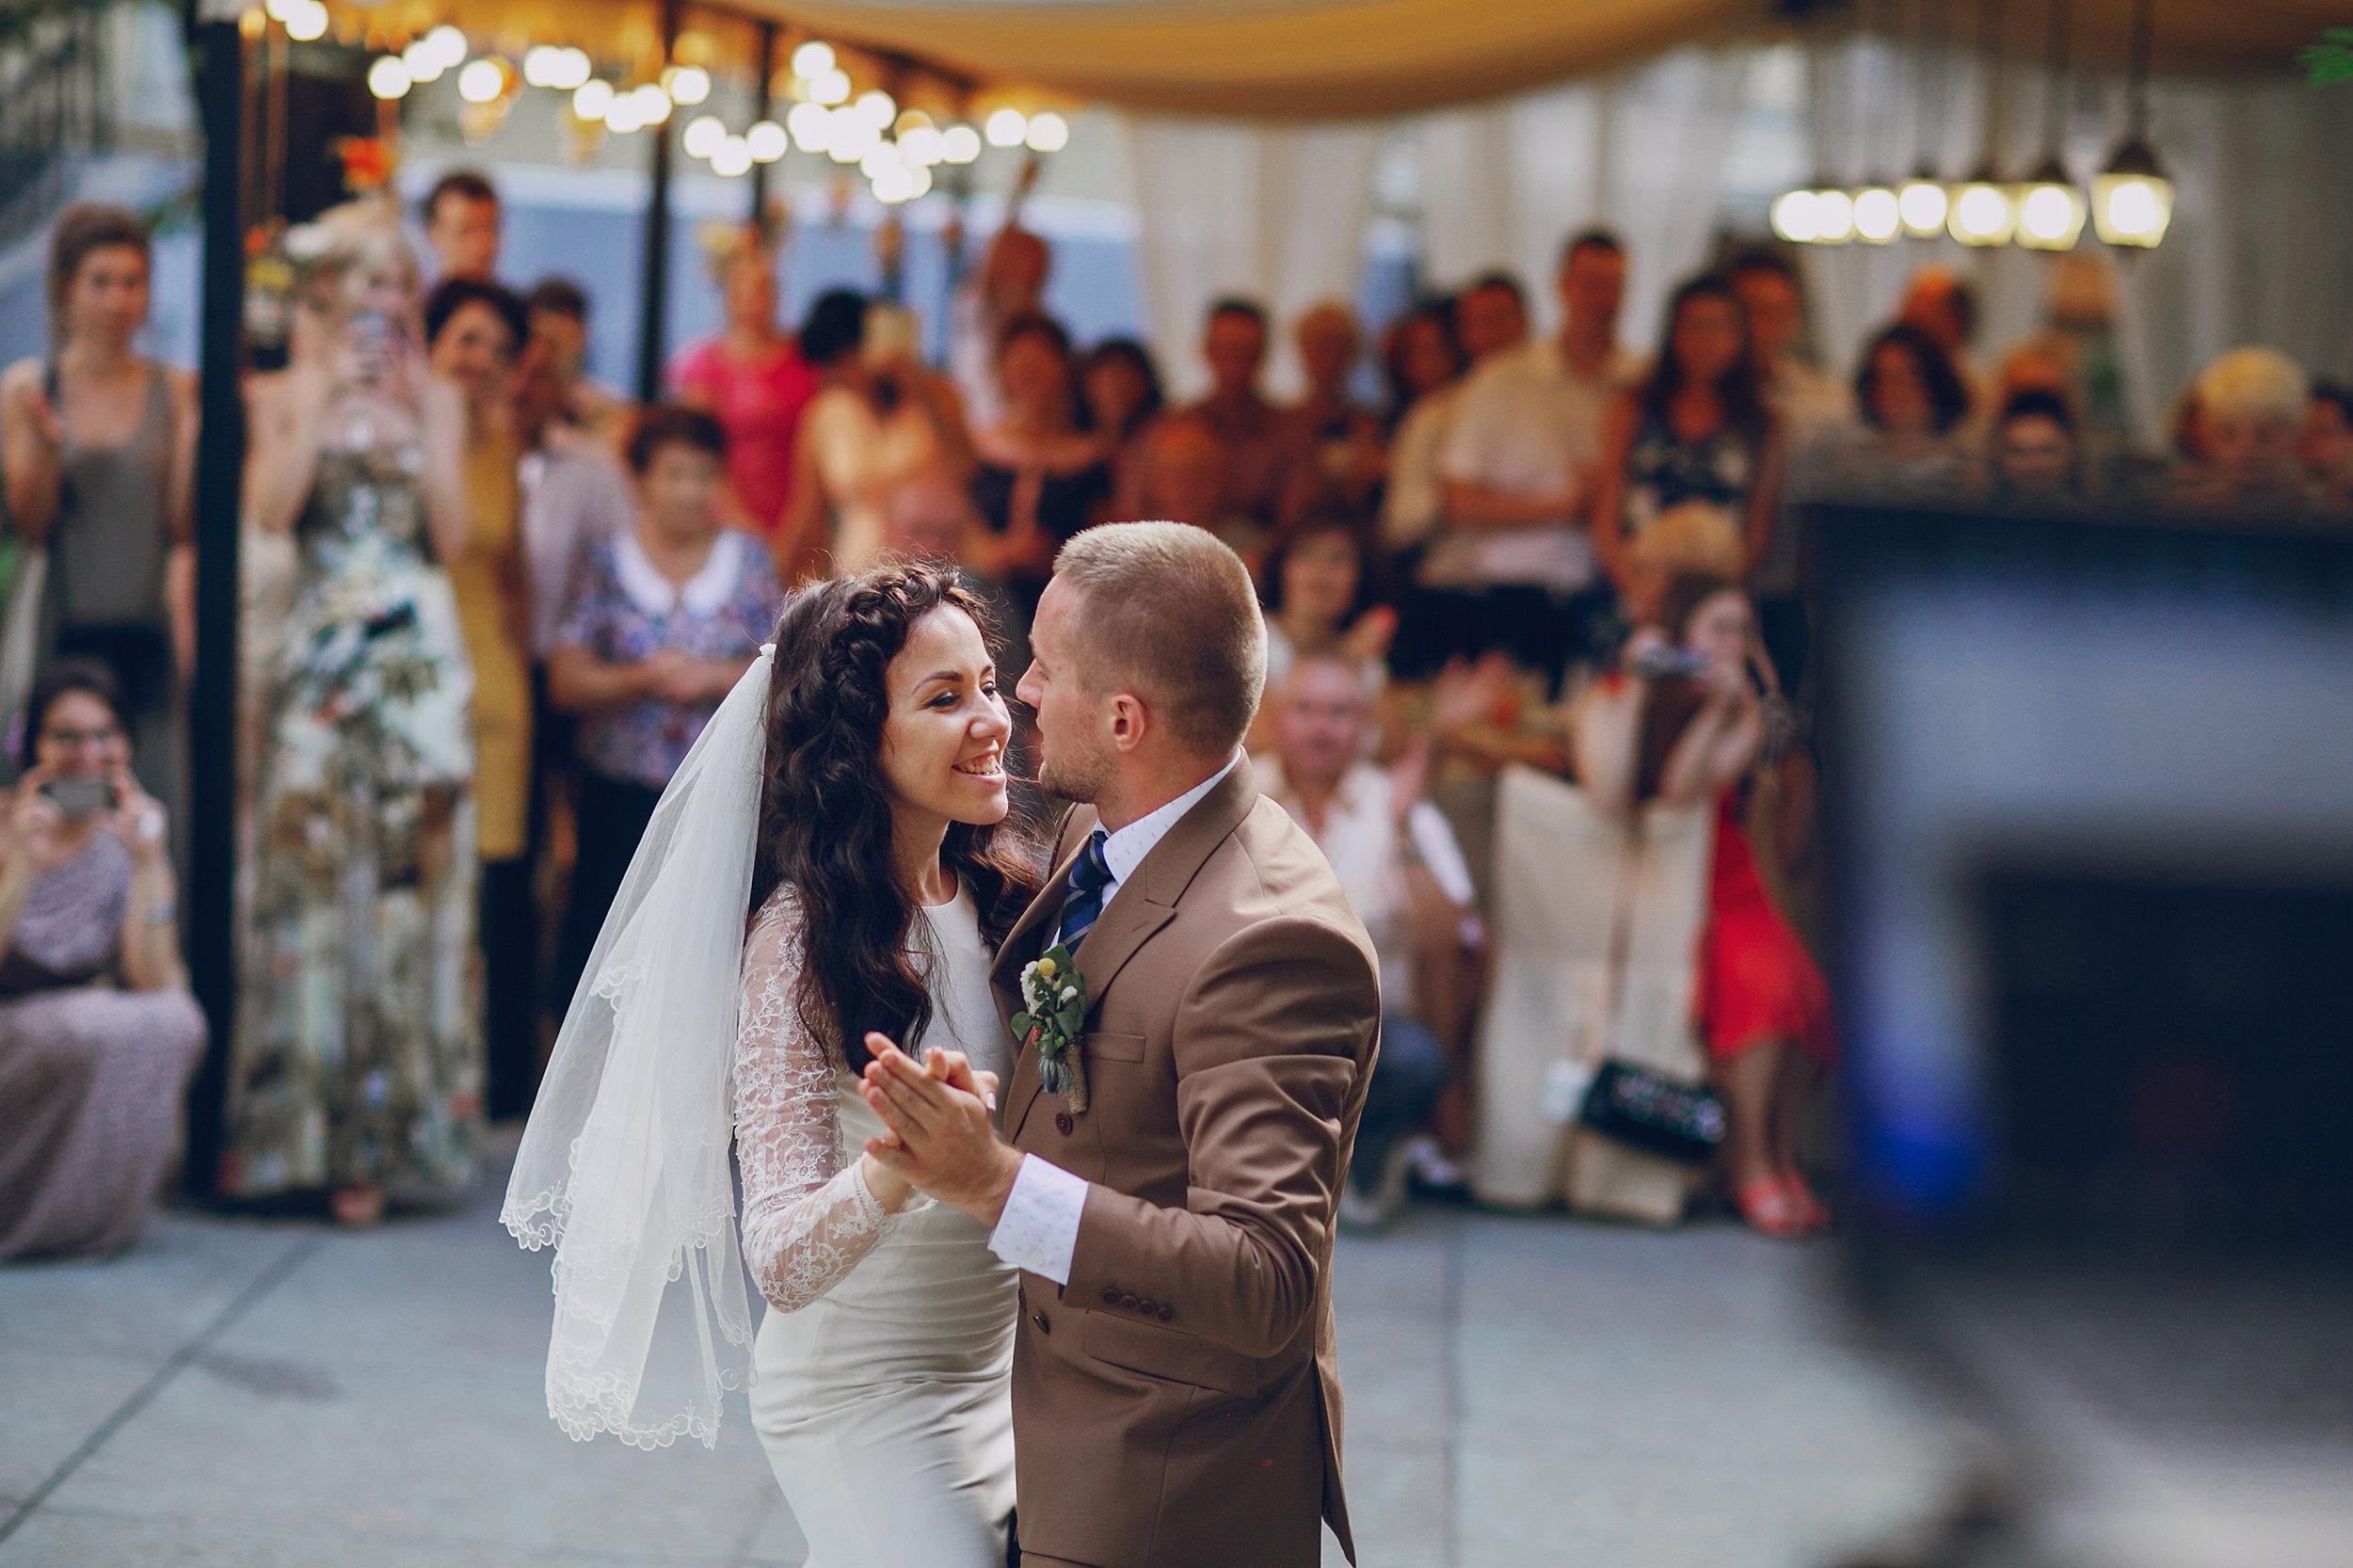 wedding_dance classes_in_Toronto (7).jpg